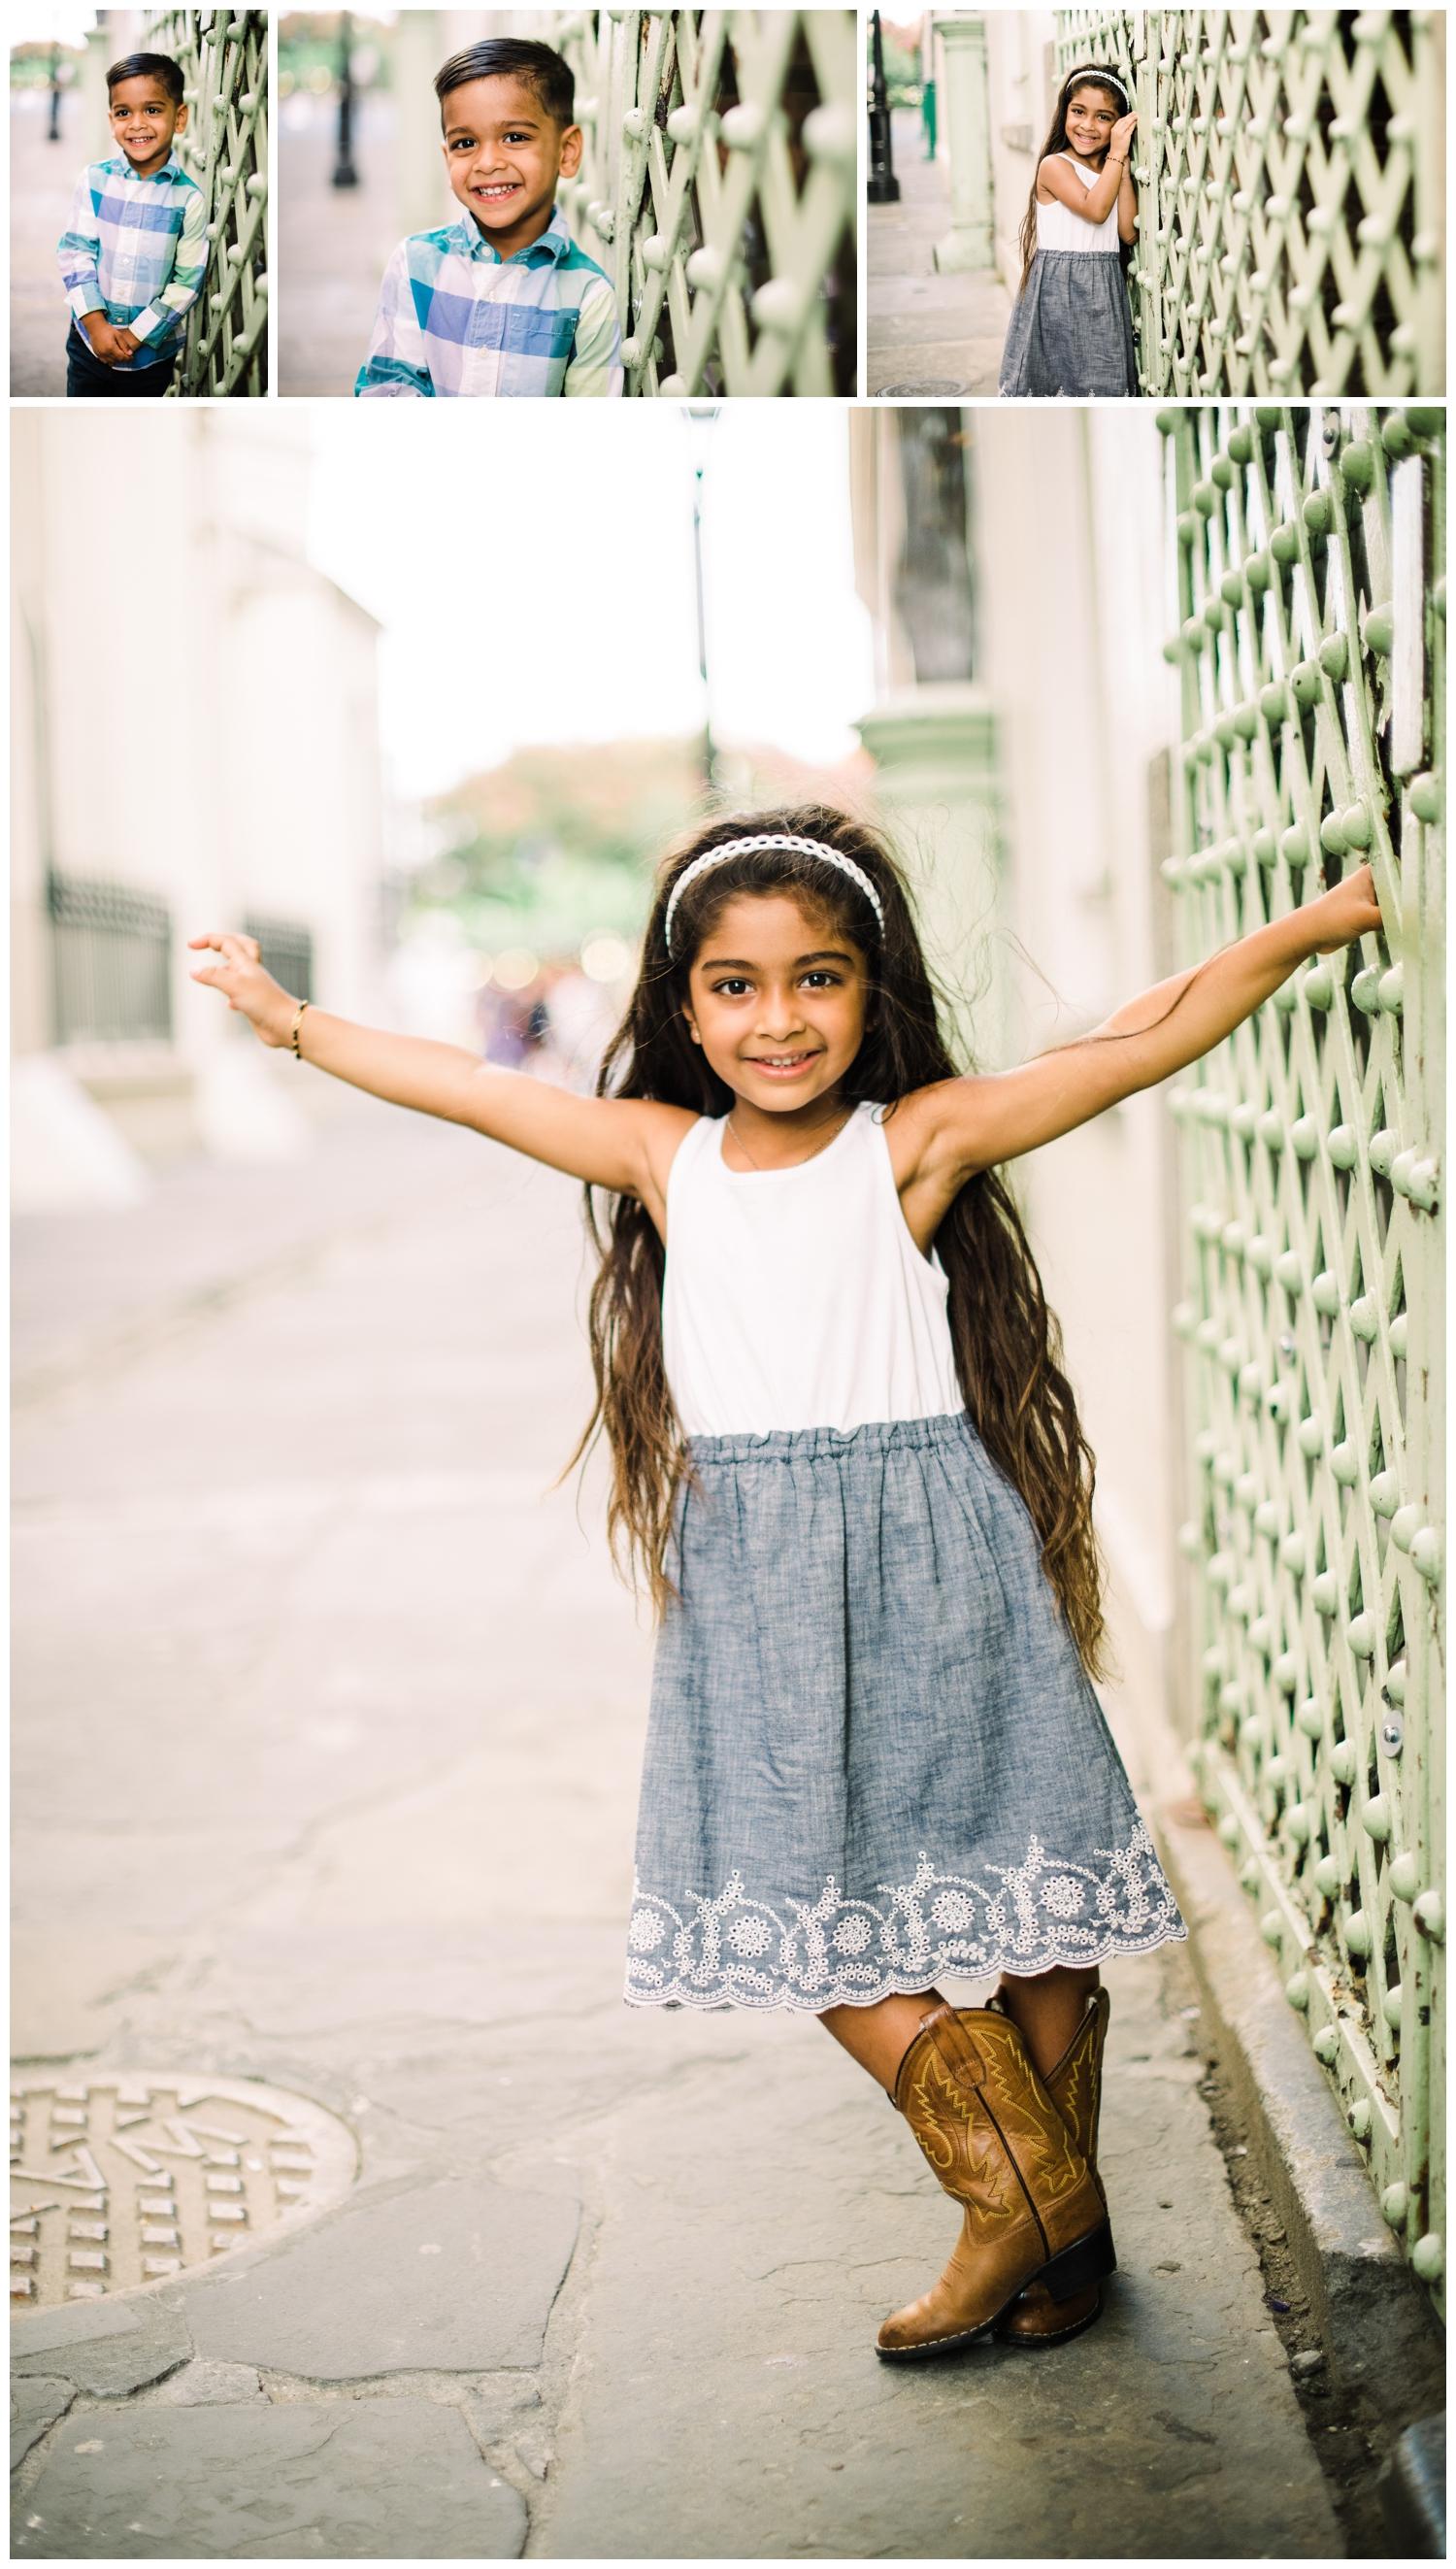 New-Orleans-family-photography- french-quarter-kallistia-photography_0003.jpg